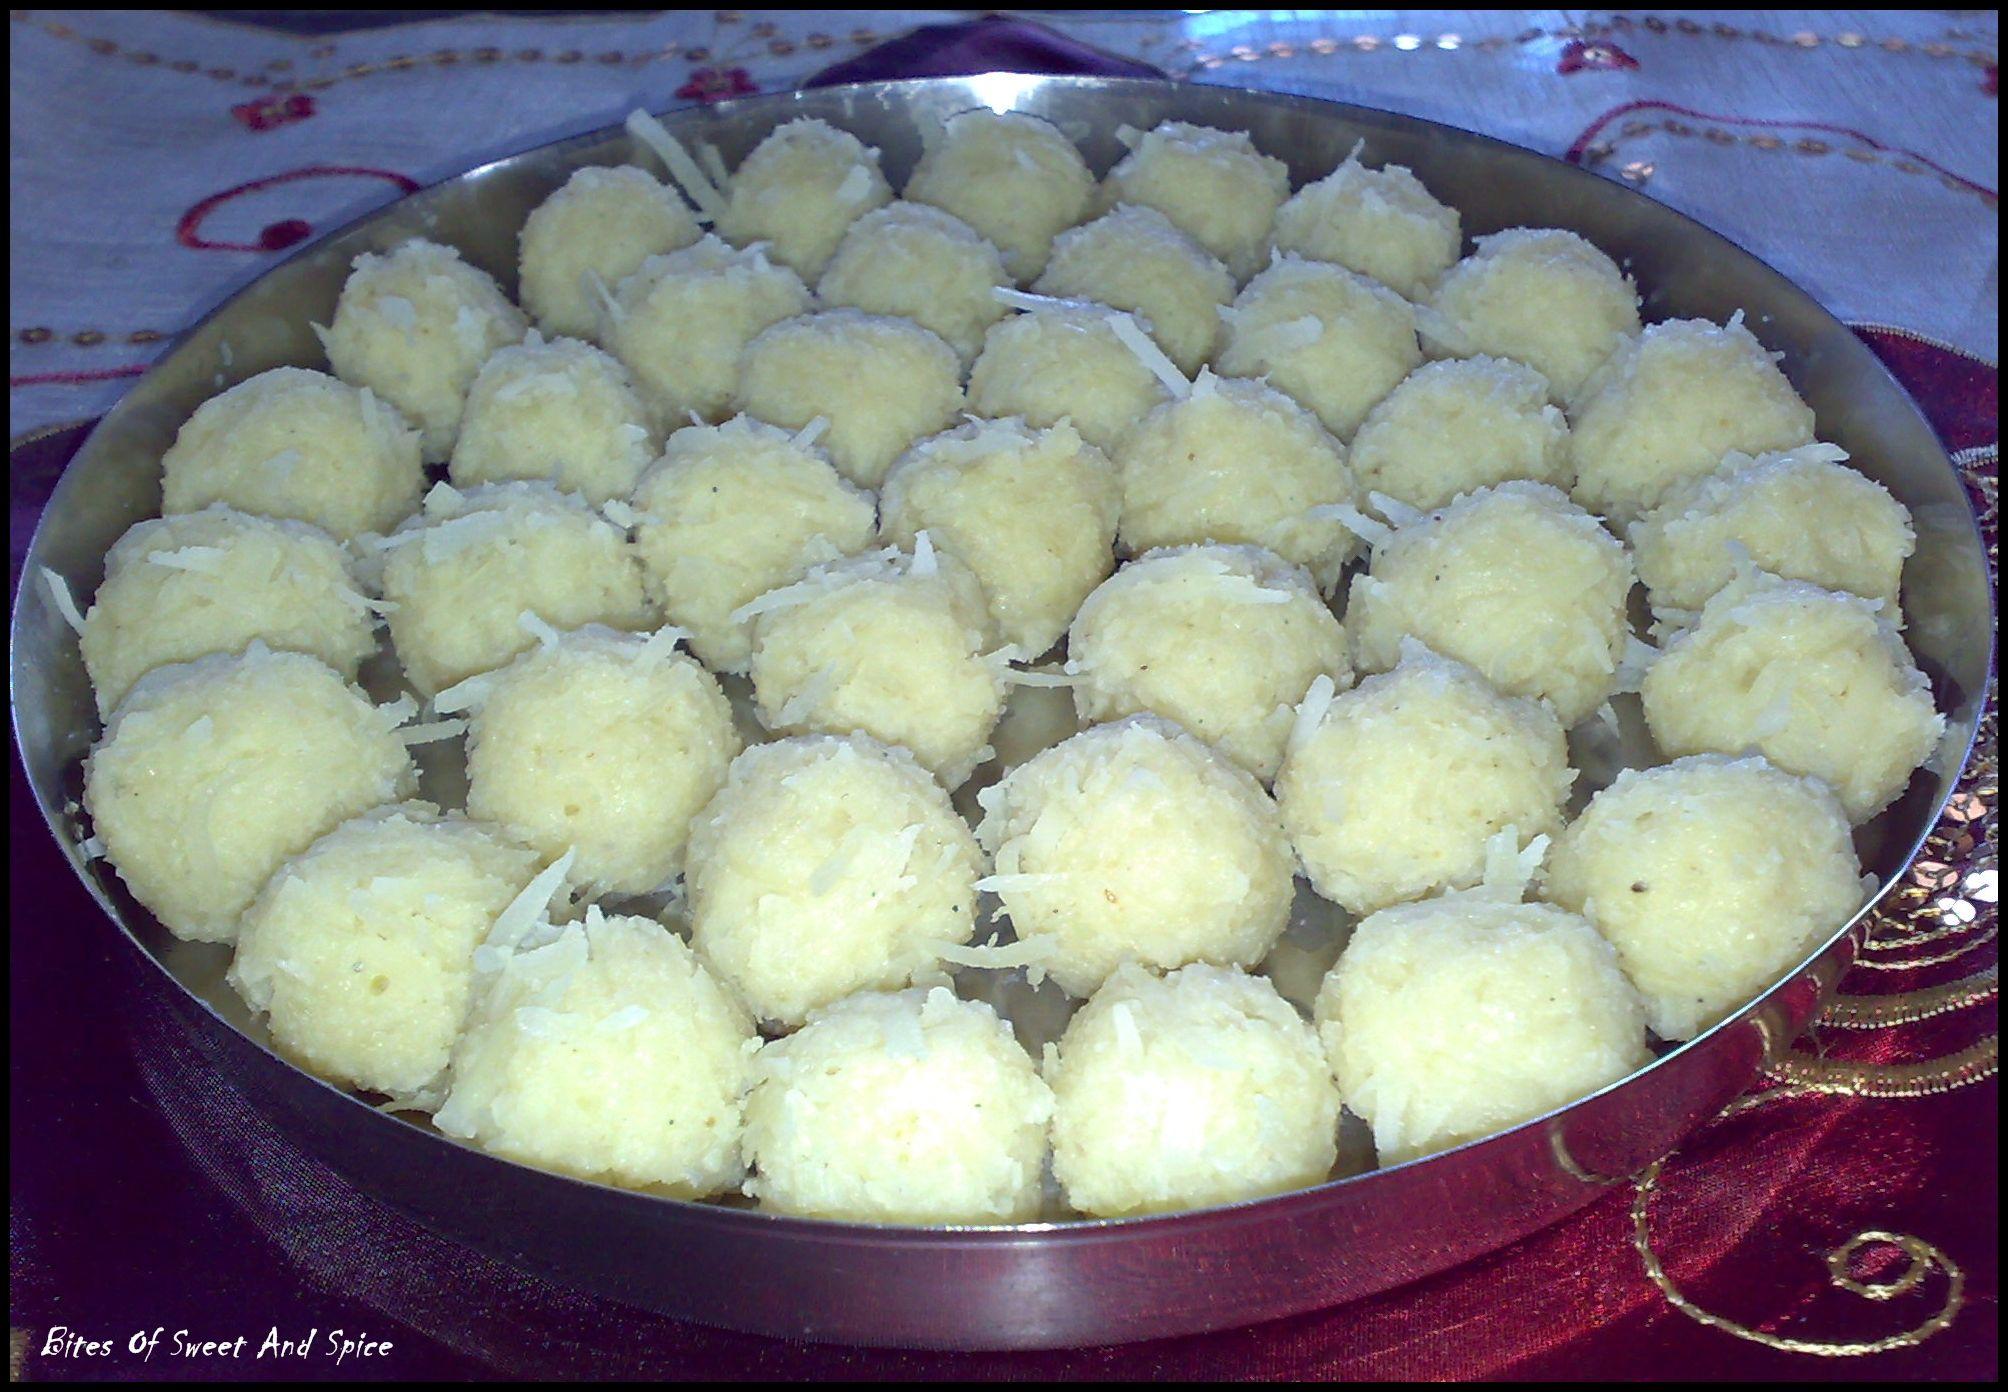 Narkel naru bengali coconut ladoo a sweet dish for durga puja narkel naru bengali coconut ladoo a sweet dish for durga puja pastry recipesindian sweetsfood forumfinder Gallery